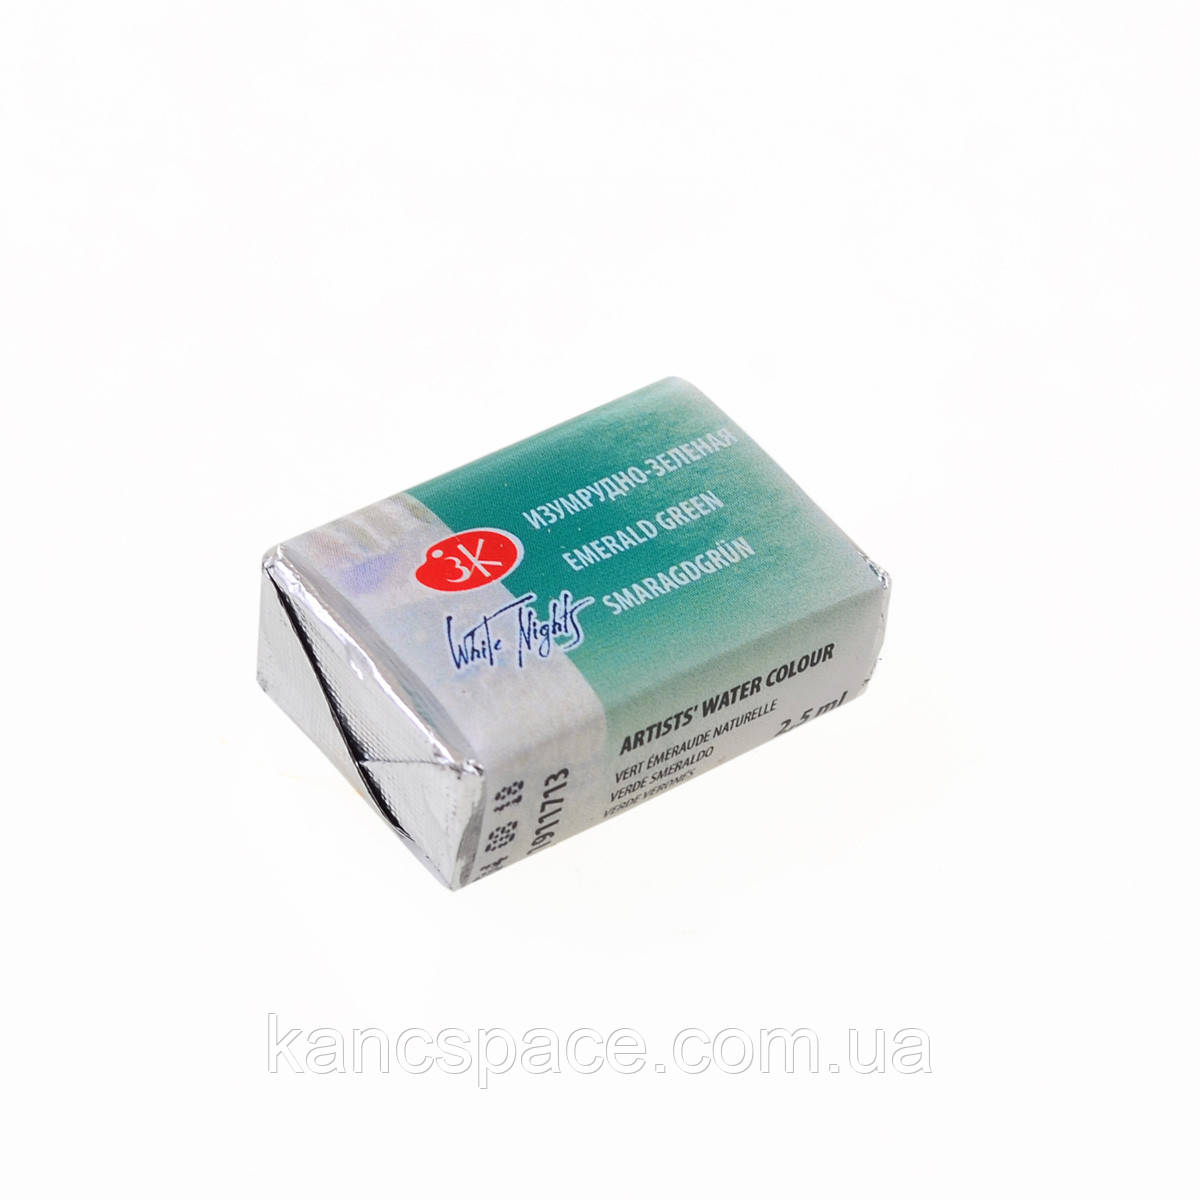 Фарба акварельна КЮВЕТА, смарагдово-зелена, 2.5мл ЗХК